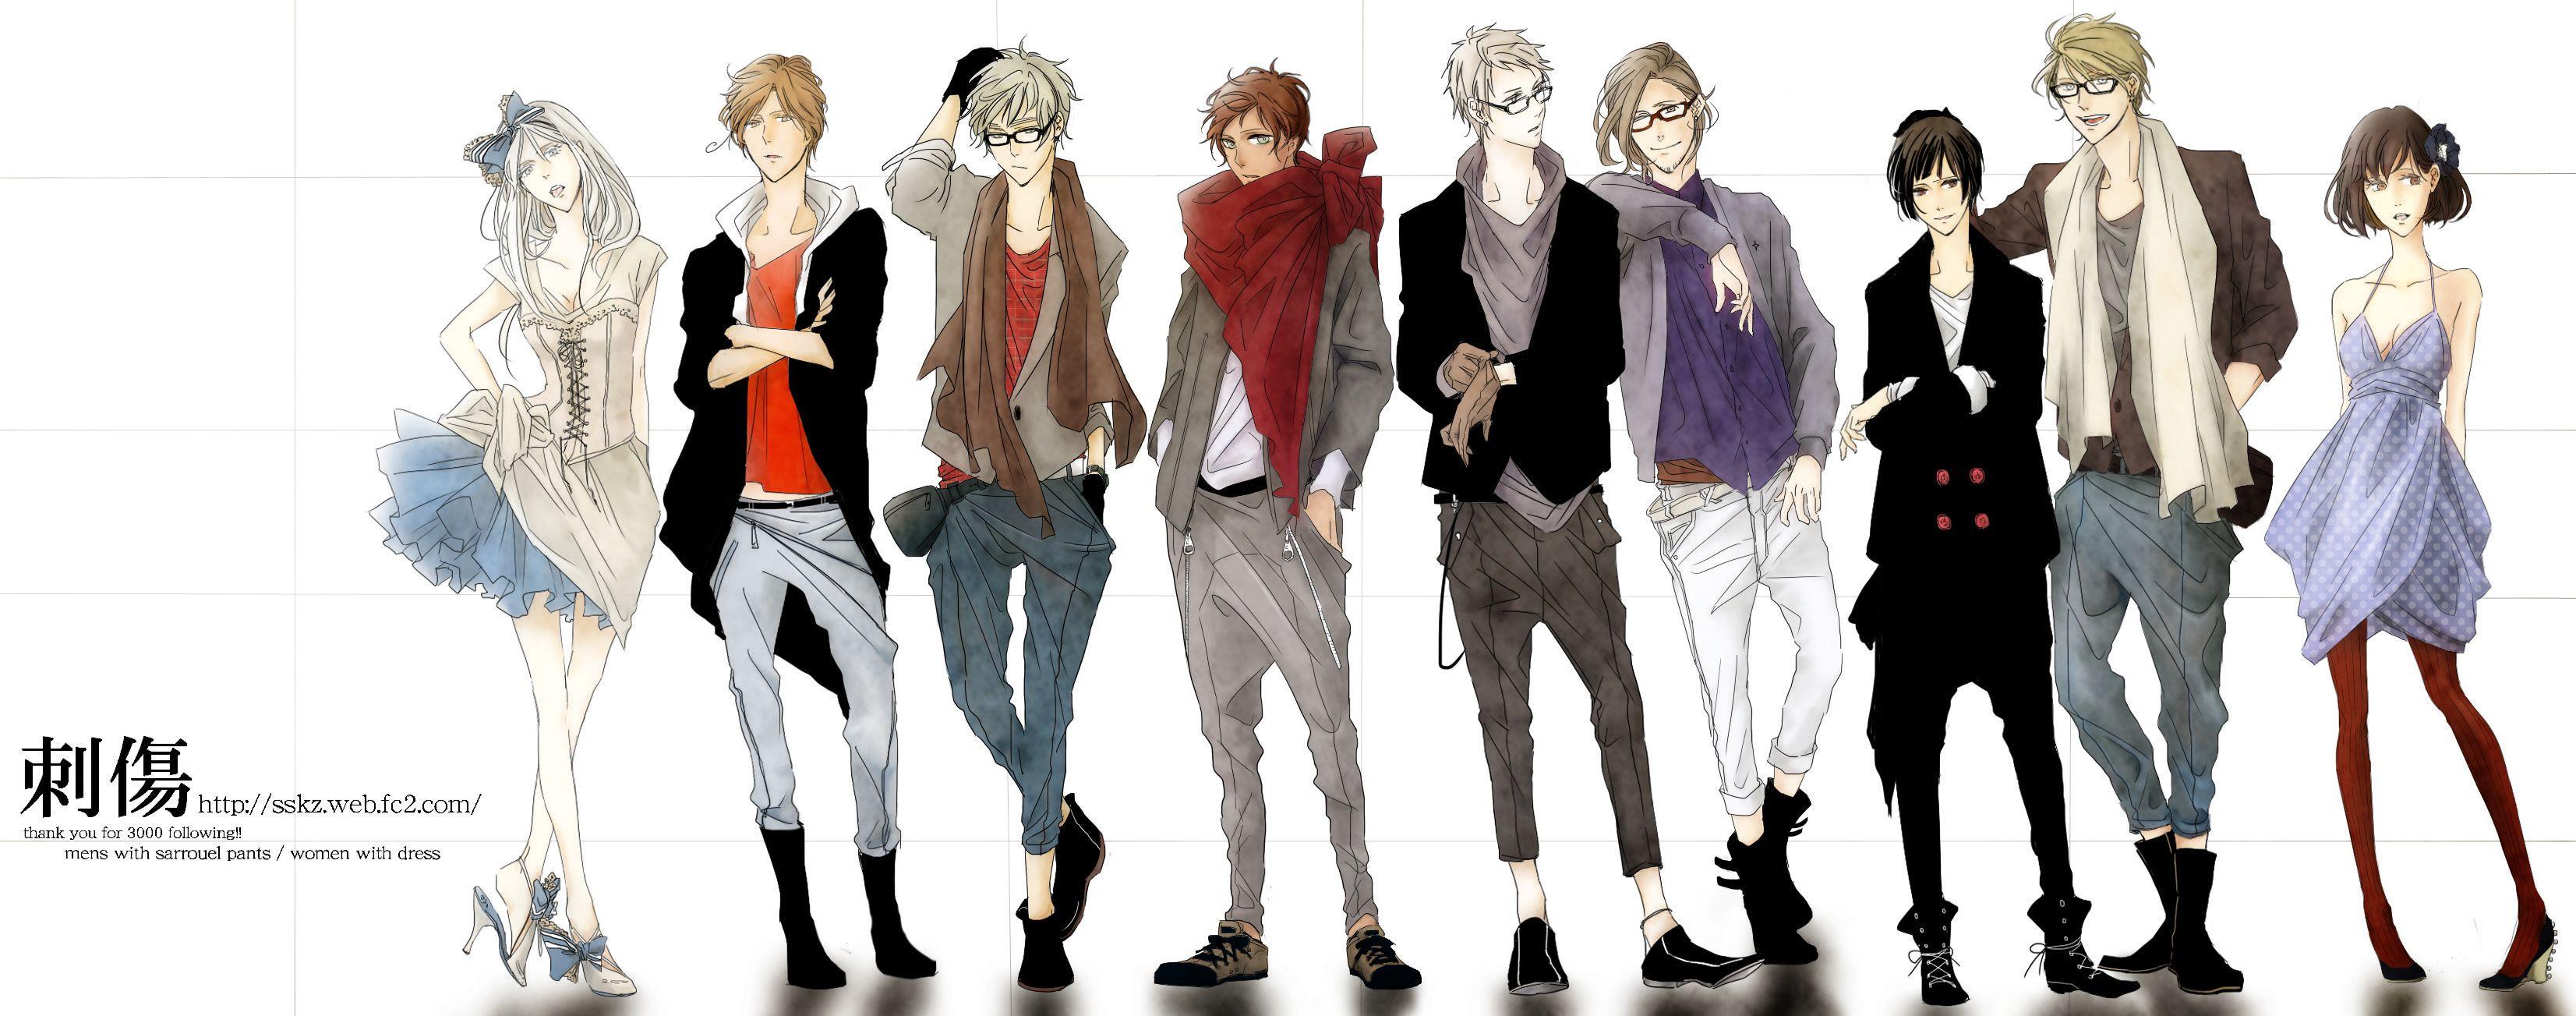 Anime Character Design Styles : Http zerochan  anime outfits pinterest